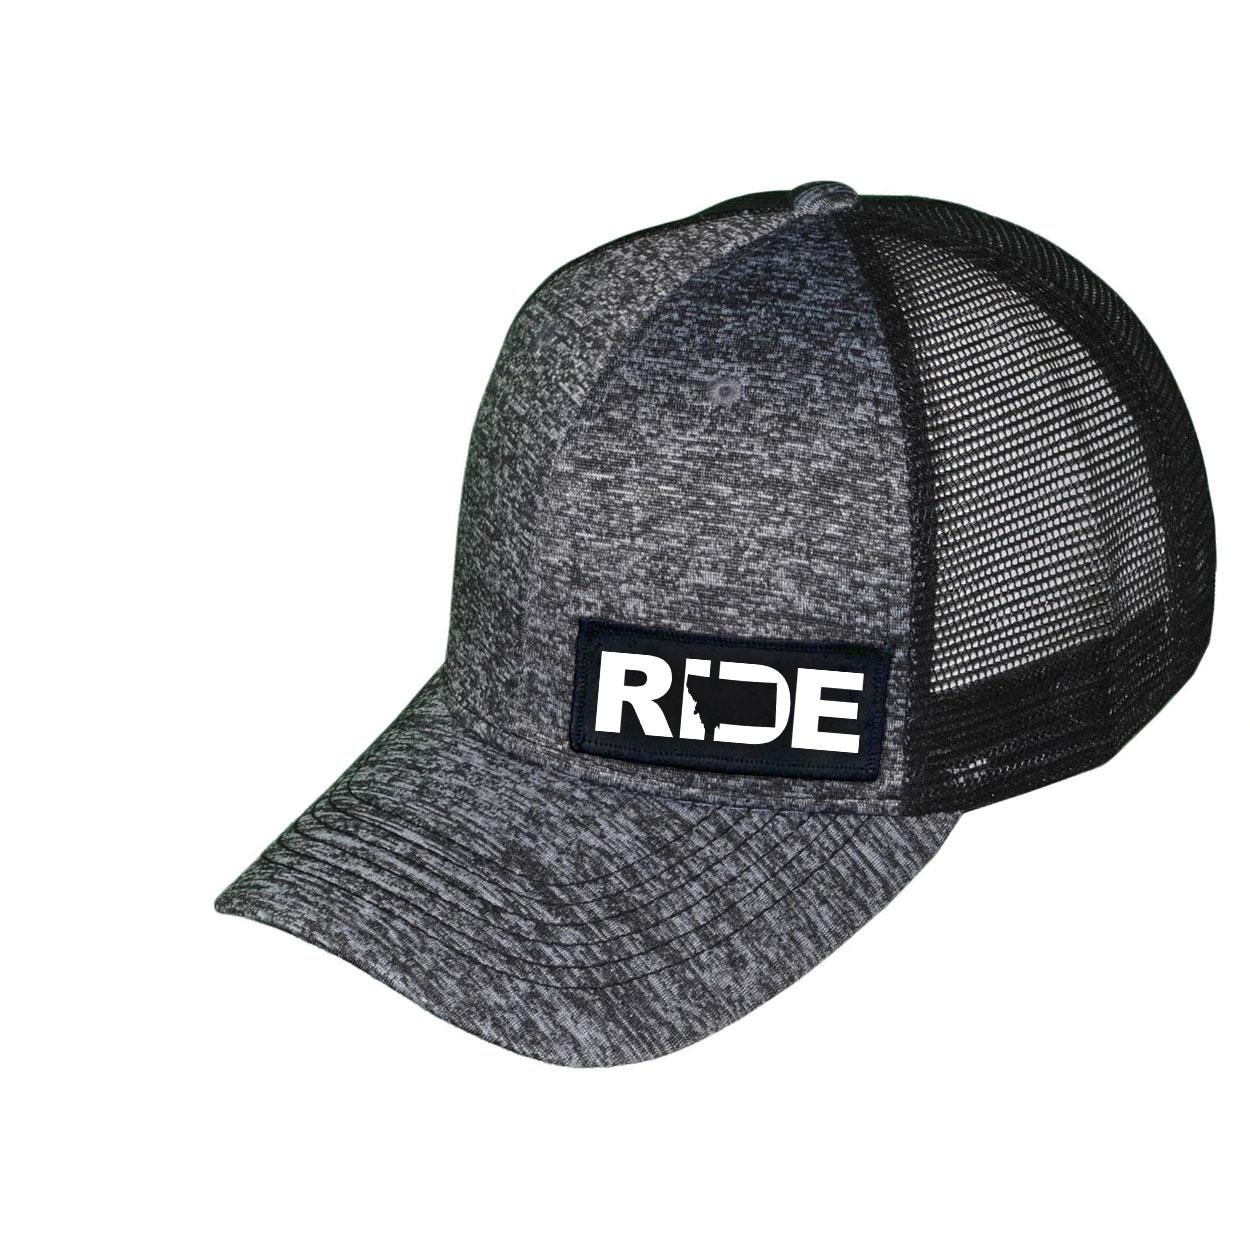 Ride Montana Night Out Woven Patch Melange Snapback Trucker Hat Gray/Black (White Logo)